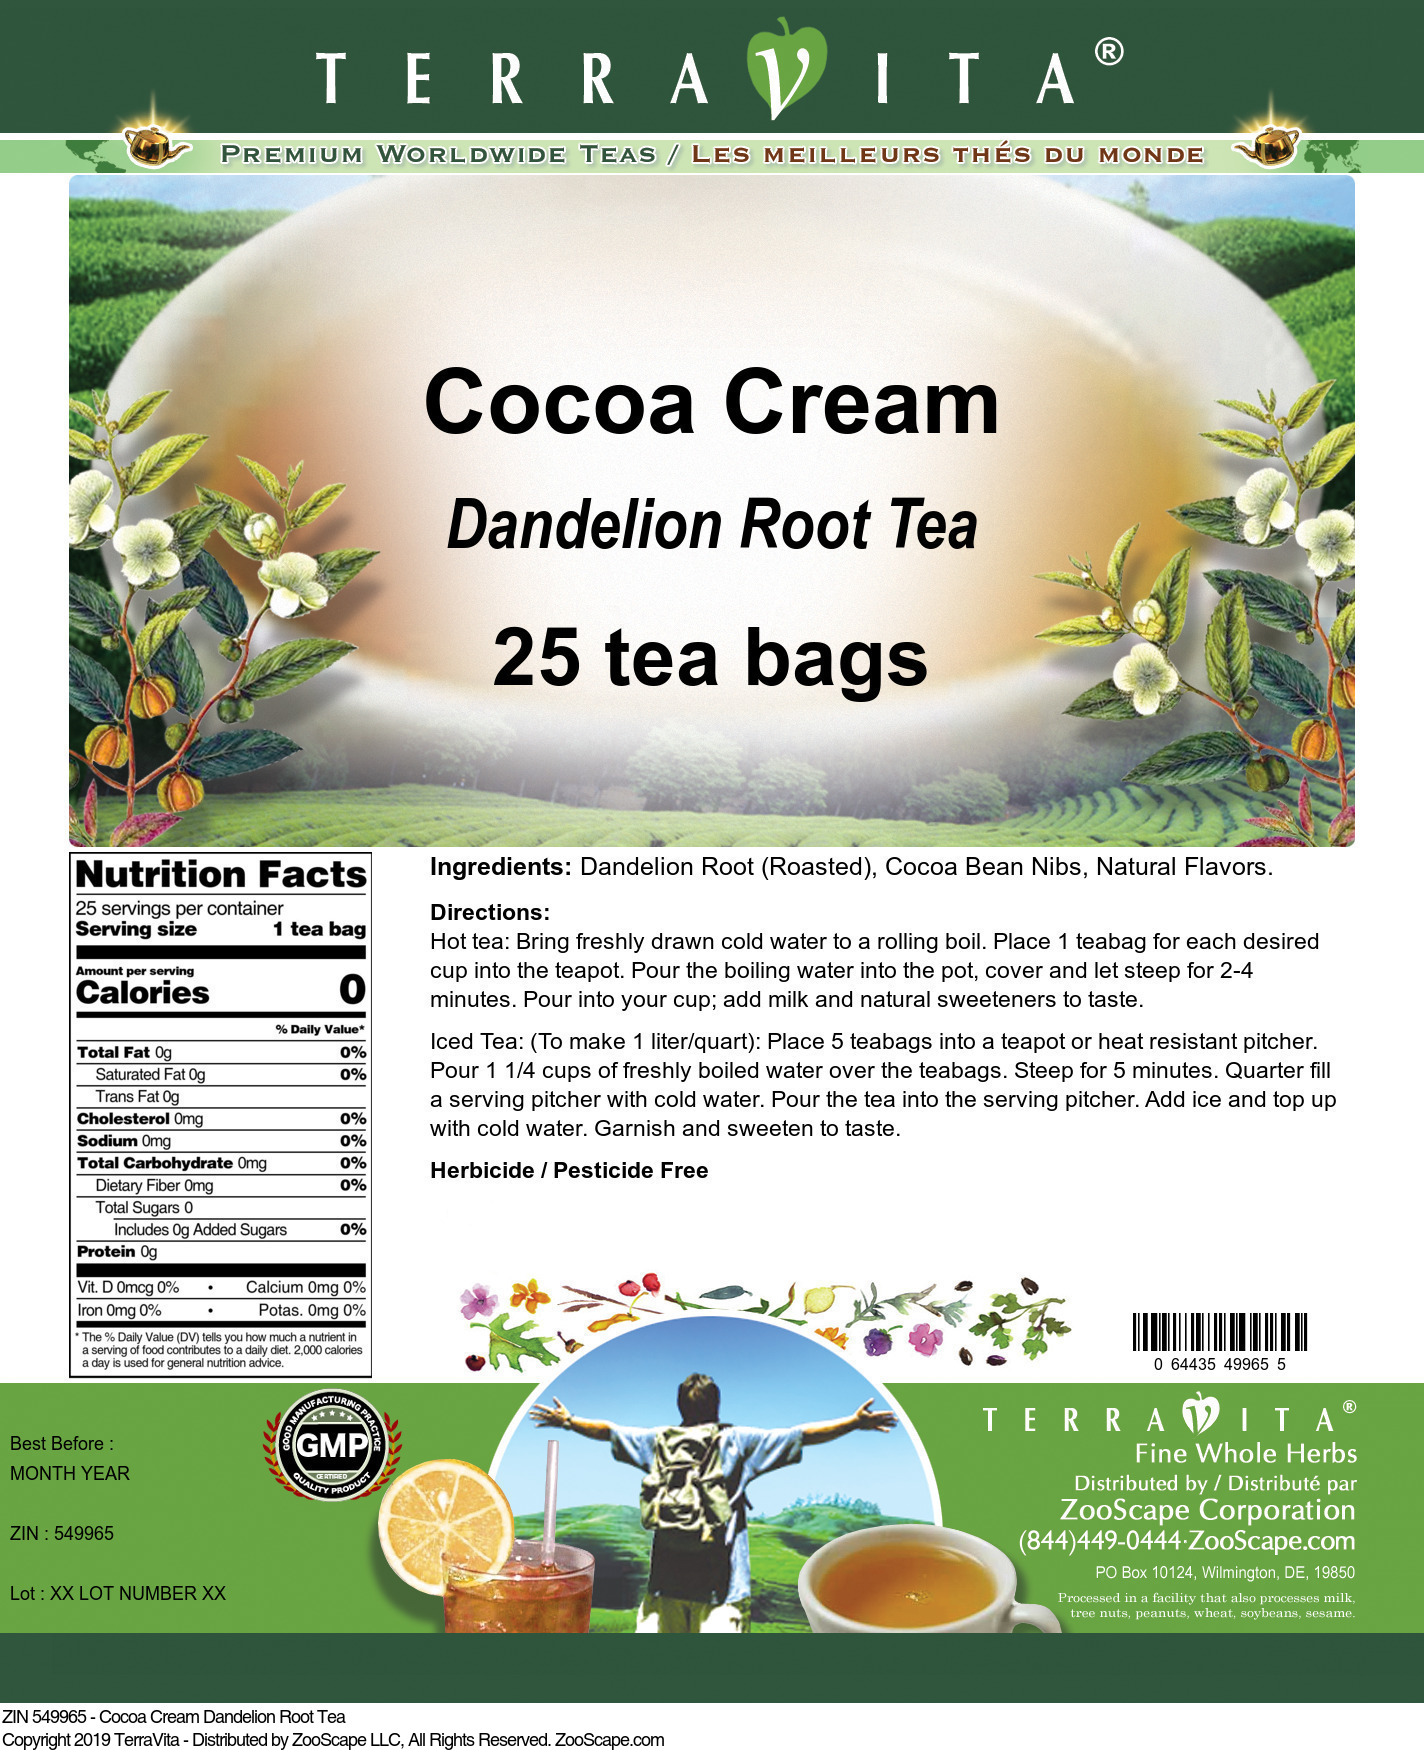 Cocoa Cream Dandelion Root Tea